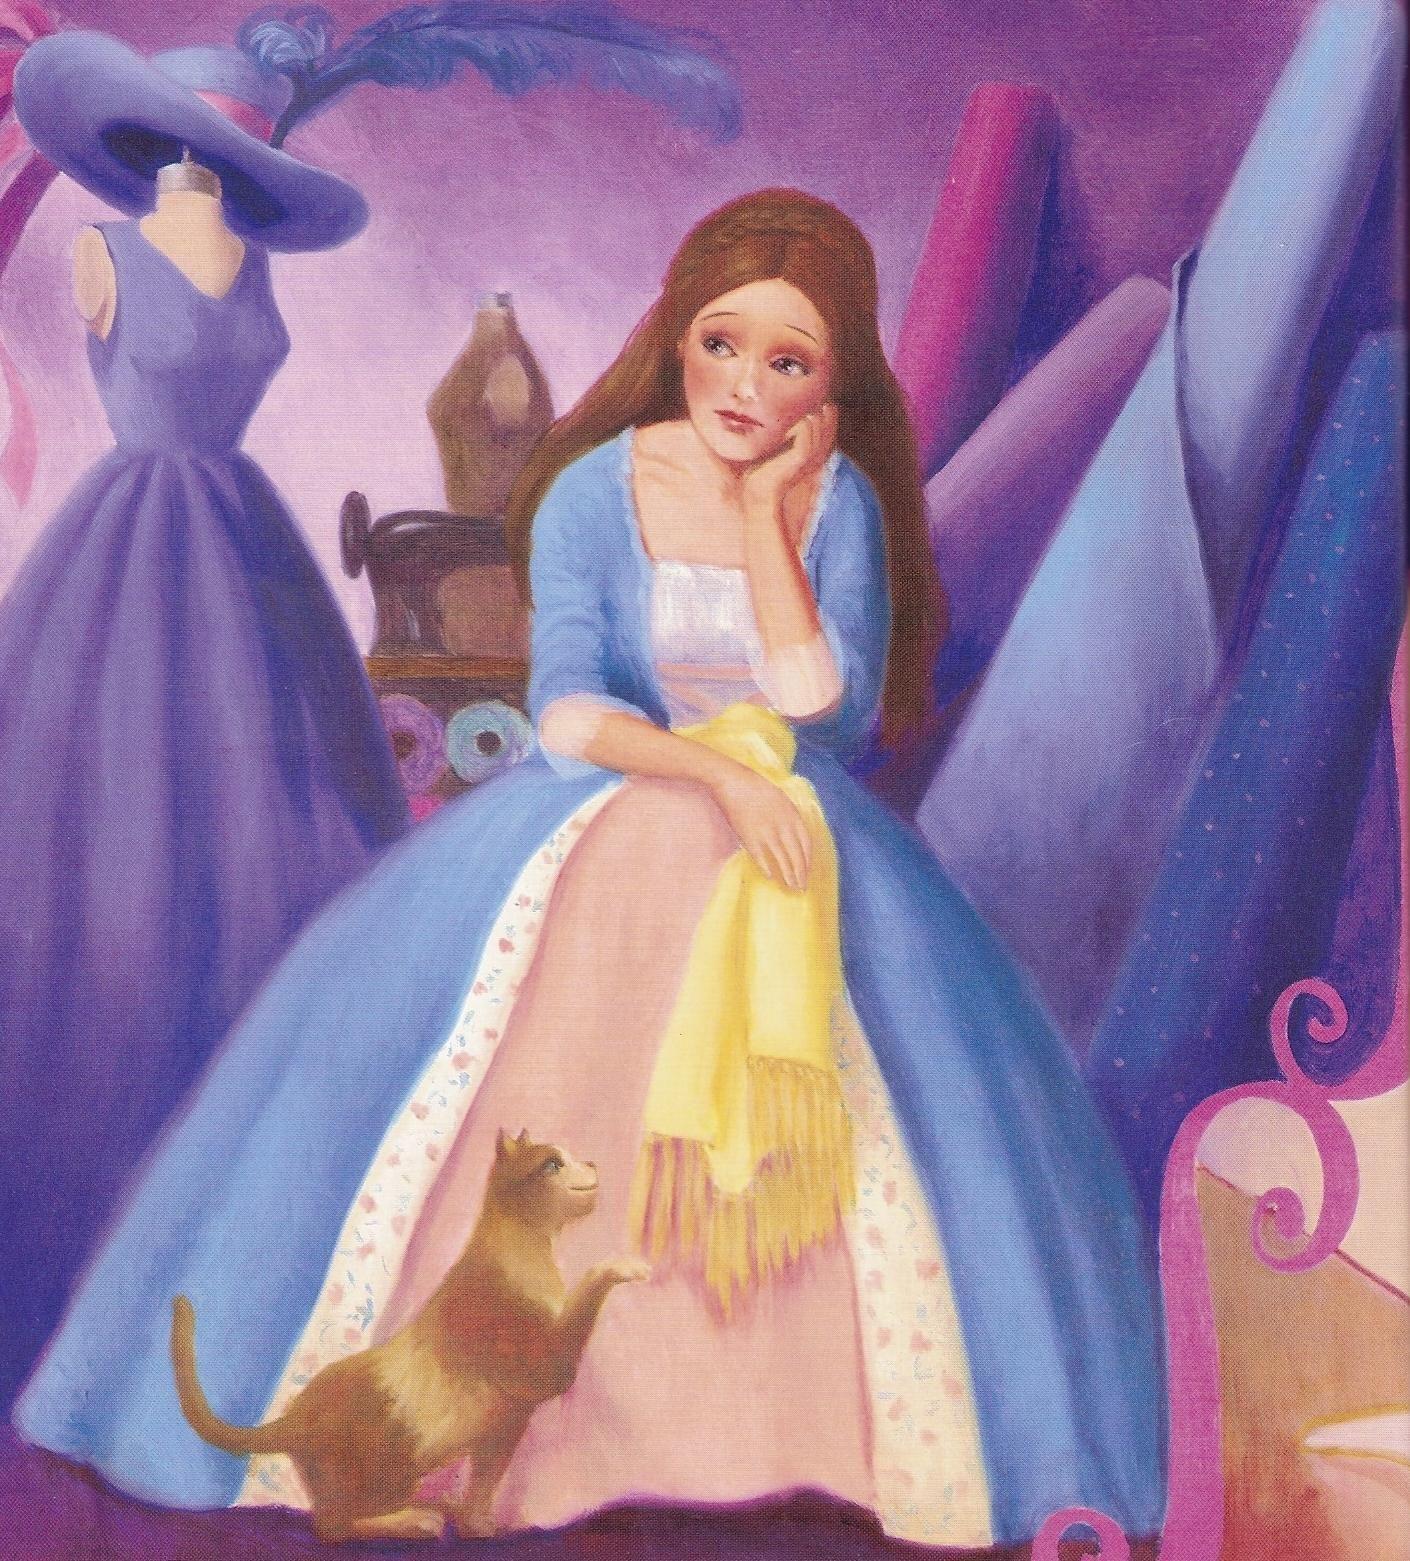 Barbie Princess And The Pauper Barbie Movies Barbie Princess